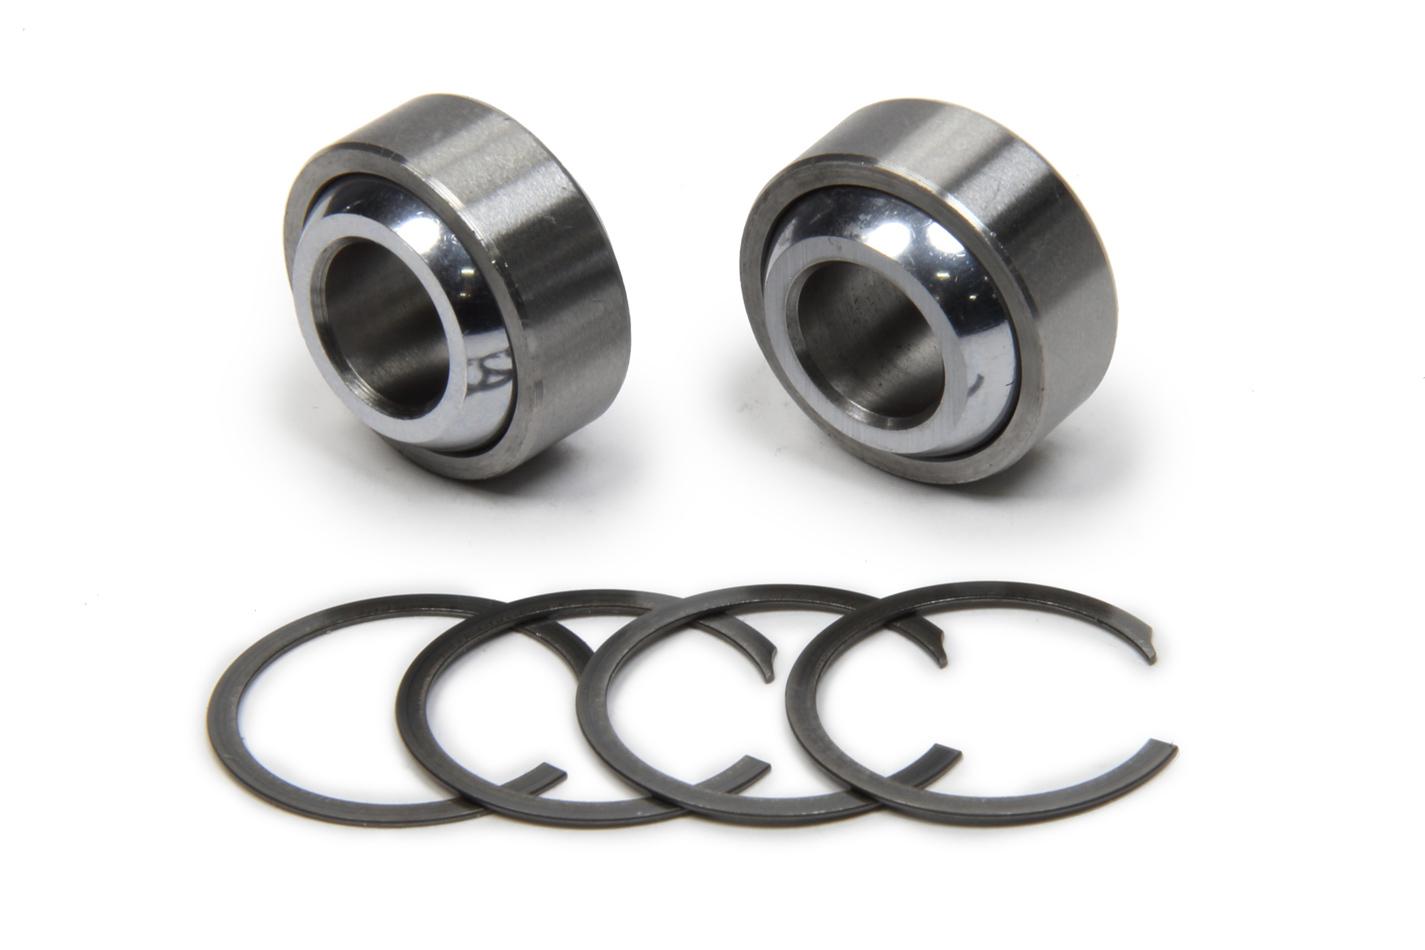 QA1 SIB10T-102PK SIB Series spherical bearing kit. Includes 2 spherical bearings, four snap rings and is made for one shock.